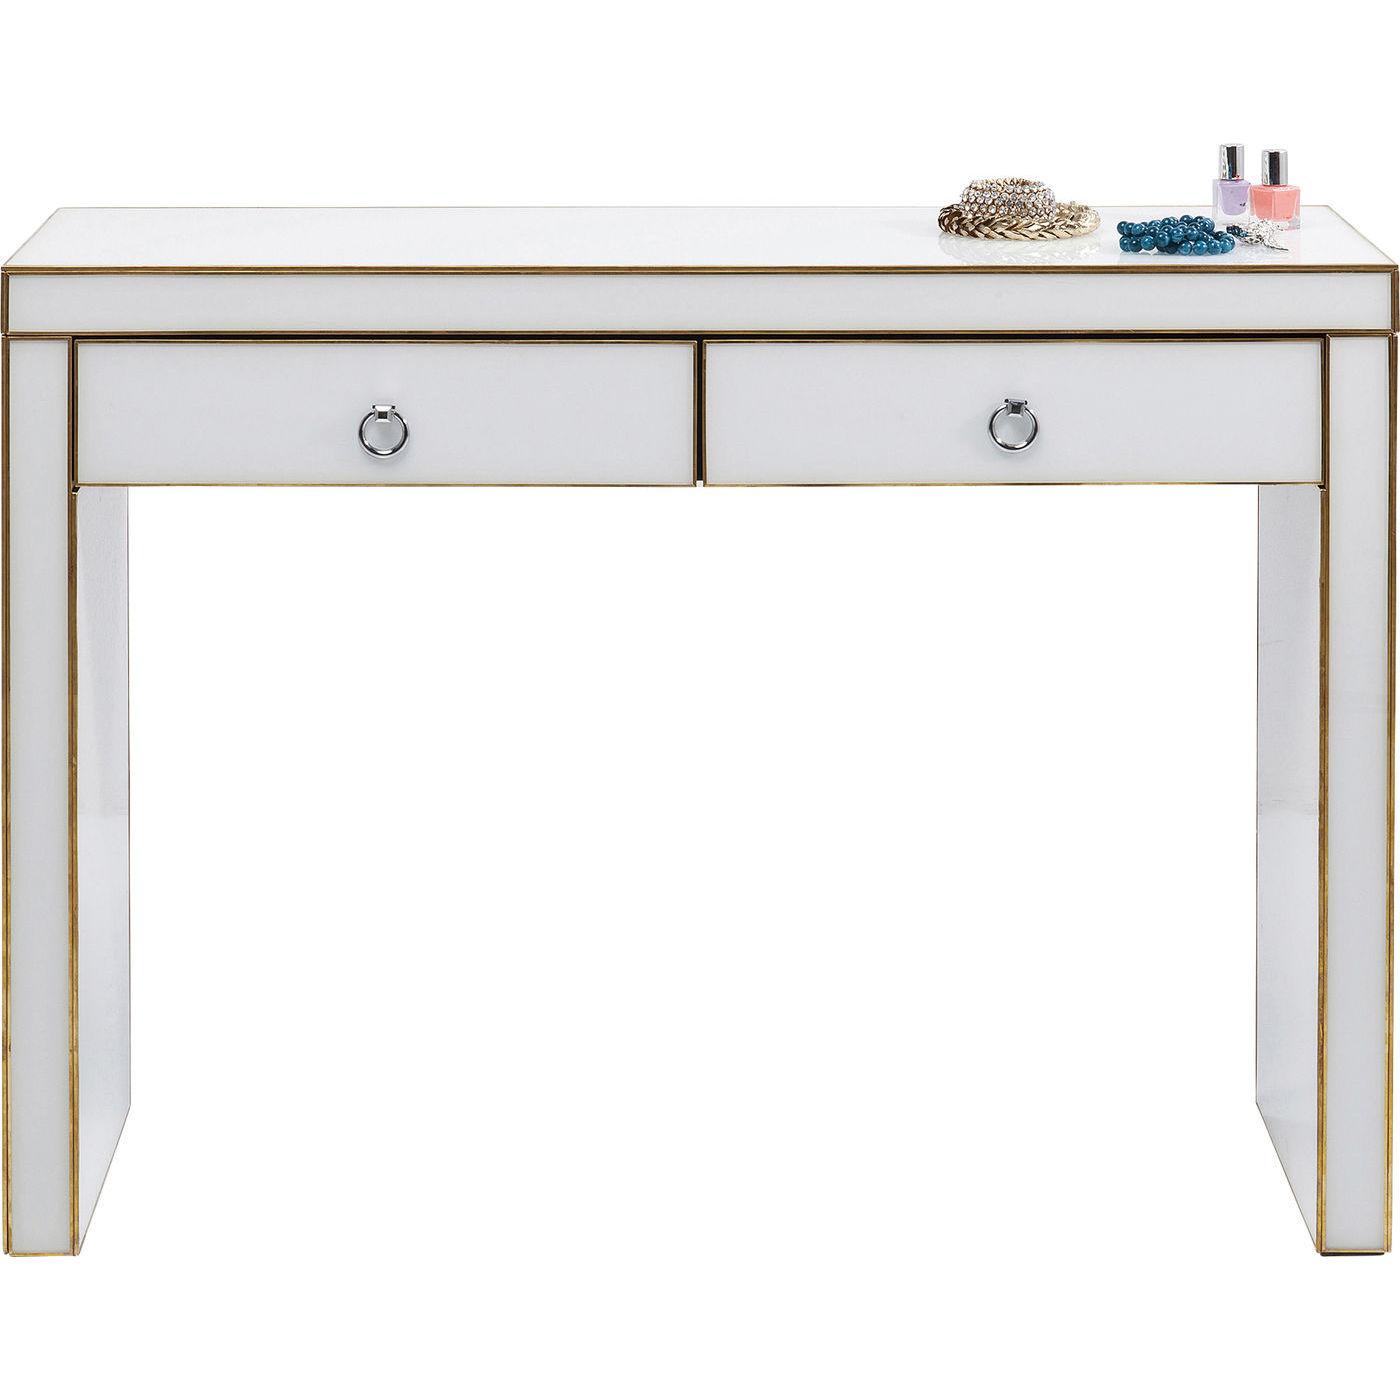 KARE DESIGN Gracioso konsolbord - hvidt glas/messing stål, m. 2 skuffer